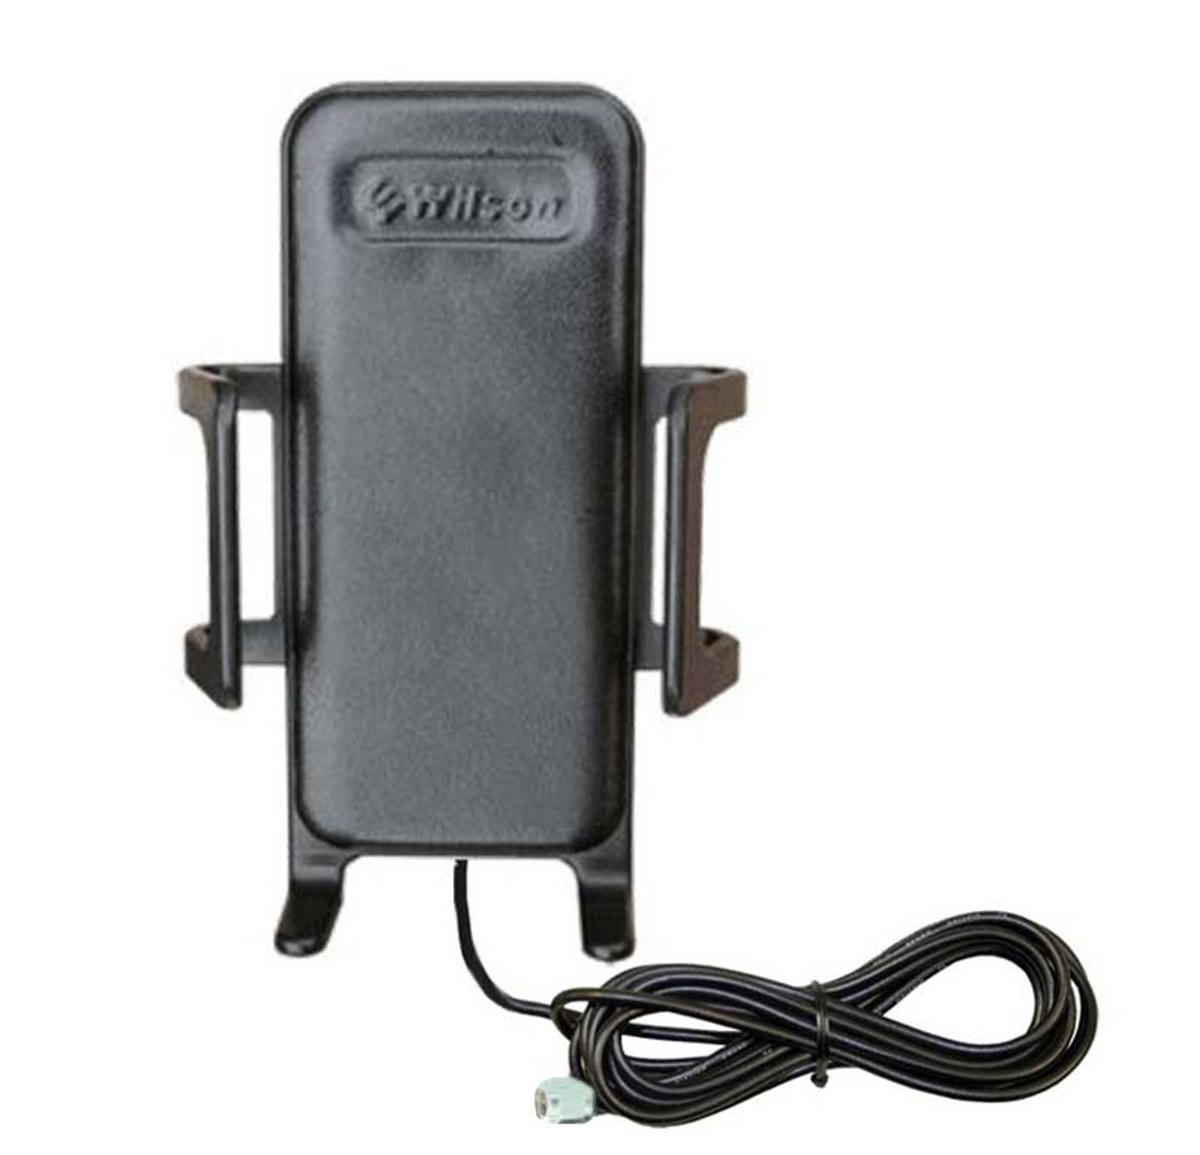 Wilson 301148, Cradle Plus Antenna Kit, with SMA-Male, main image 2